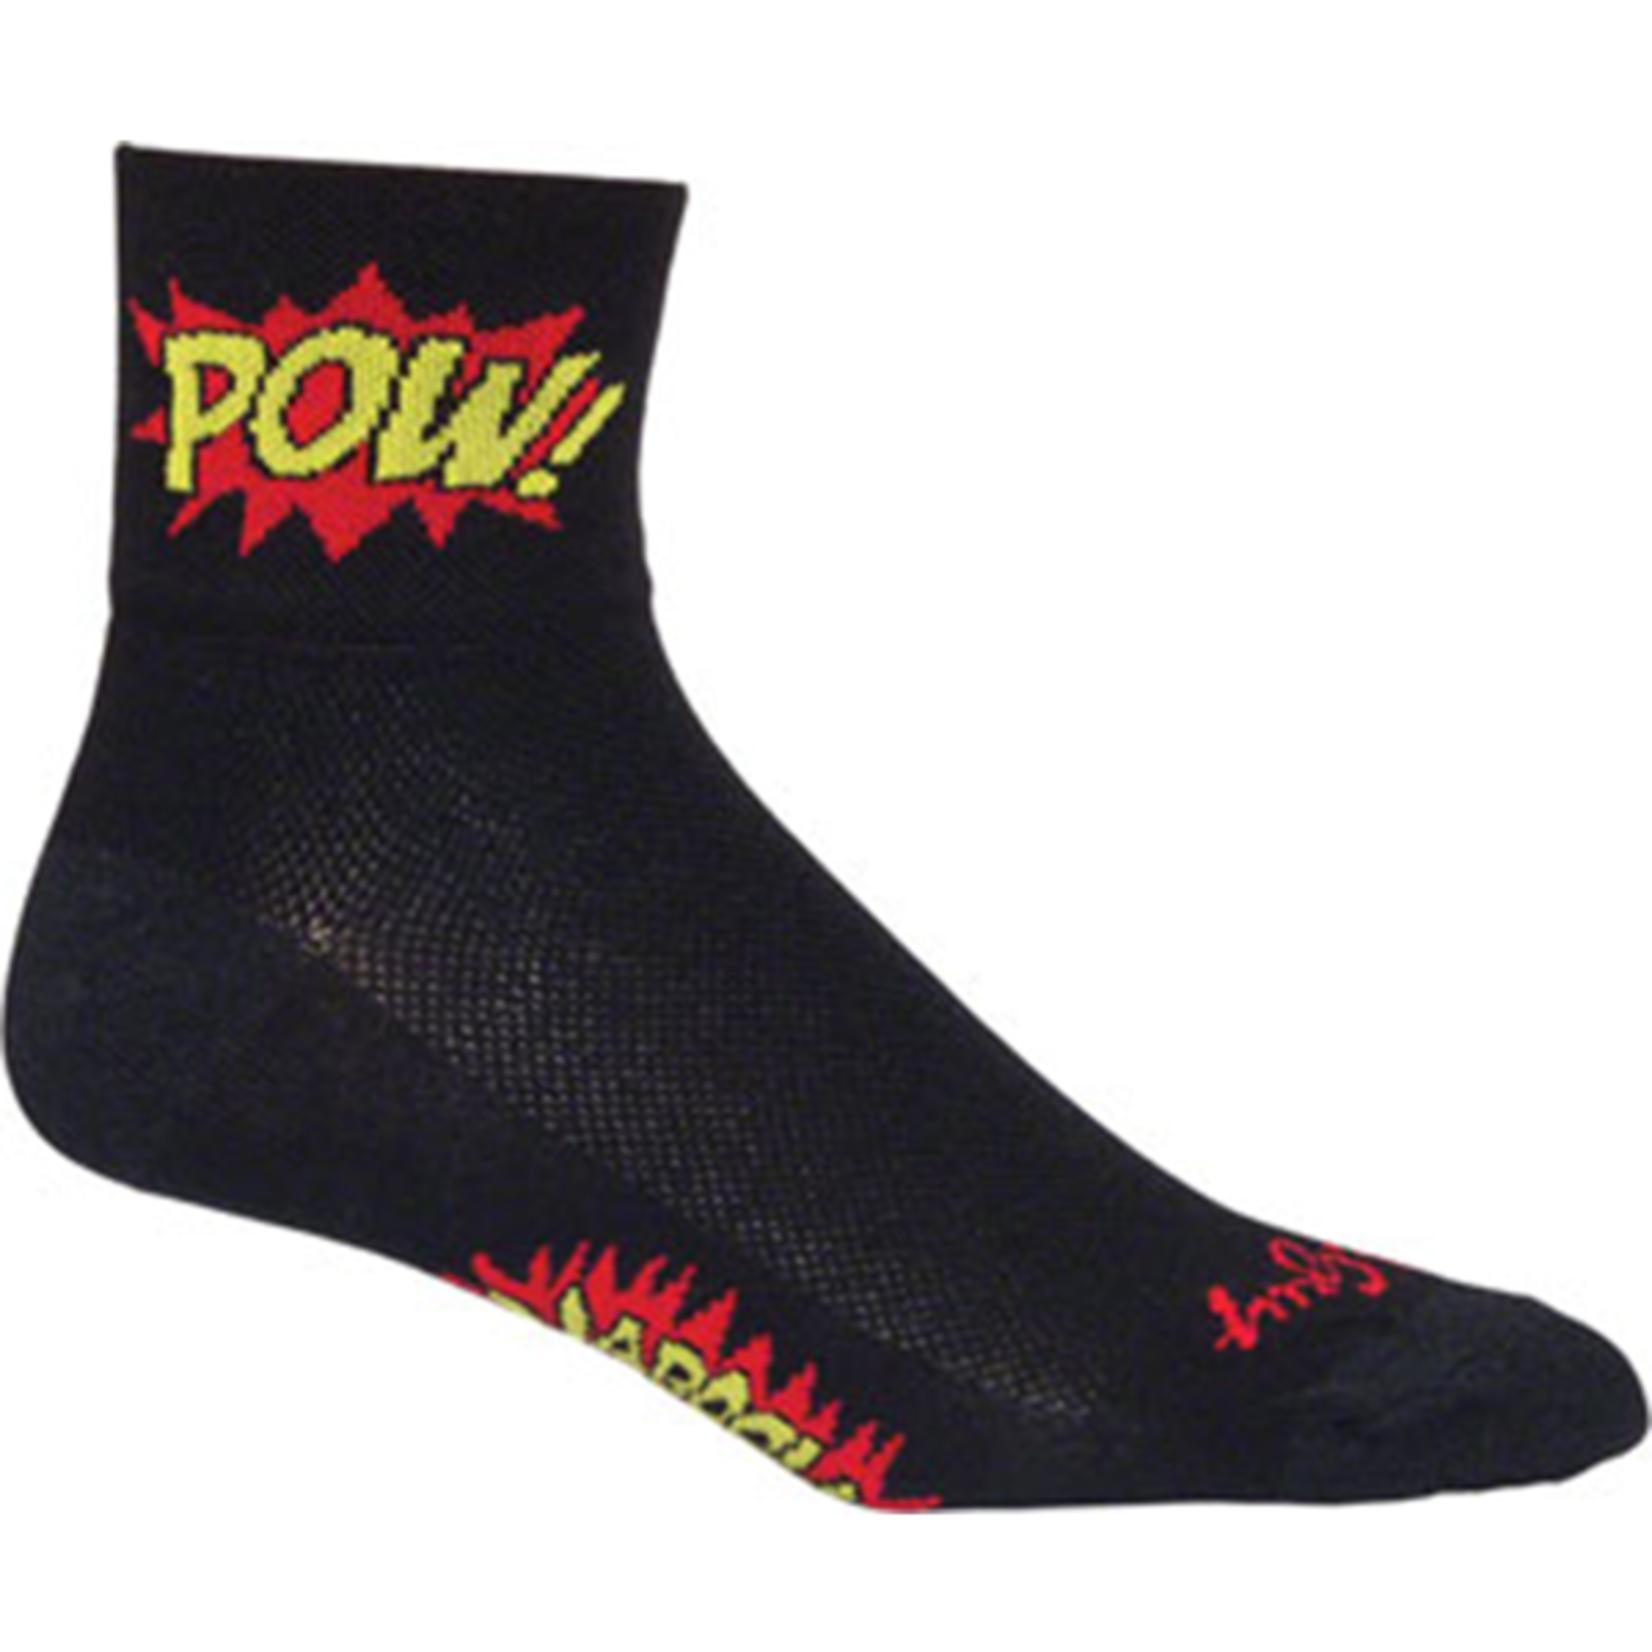 SockGuy SockGuy Classic Boom Pow Socks - 3 inch, Black, Small/Medium